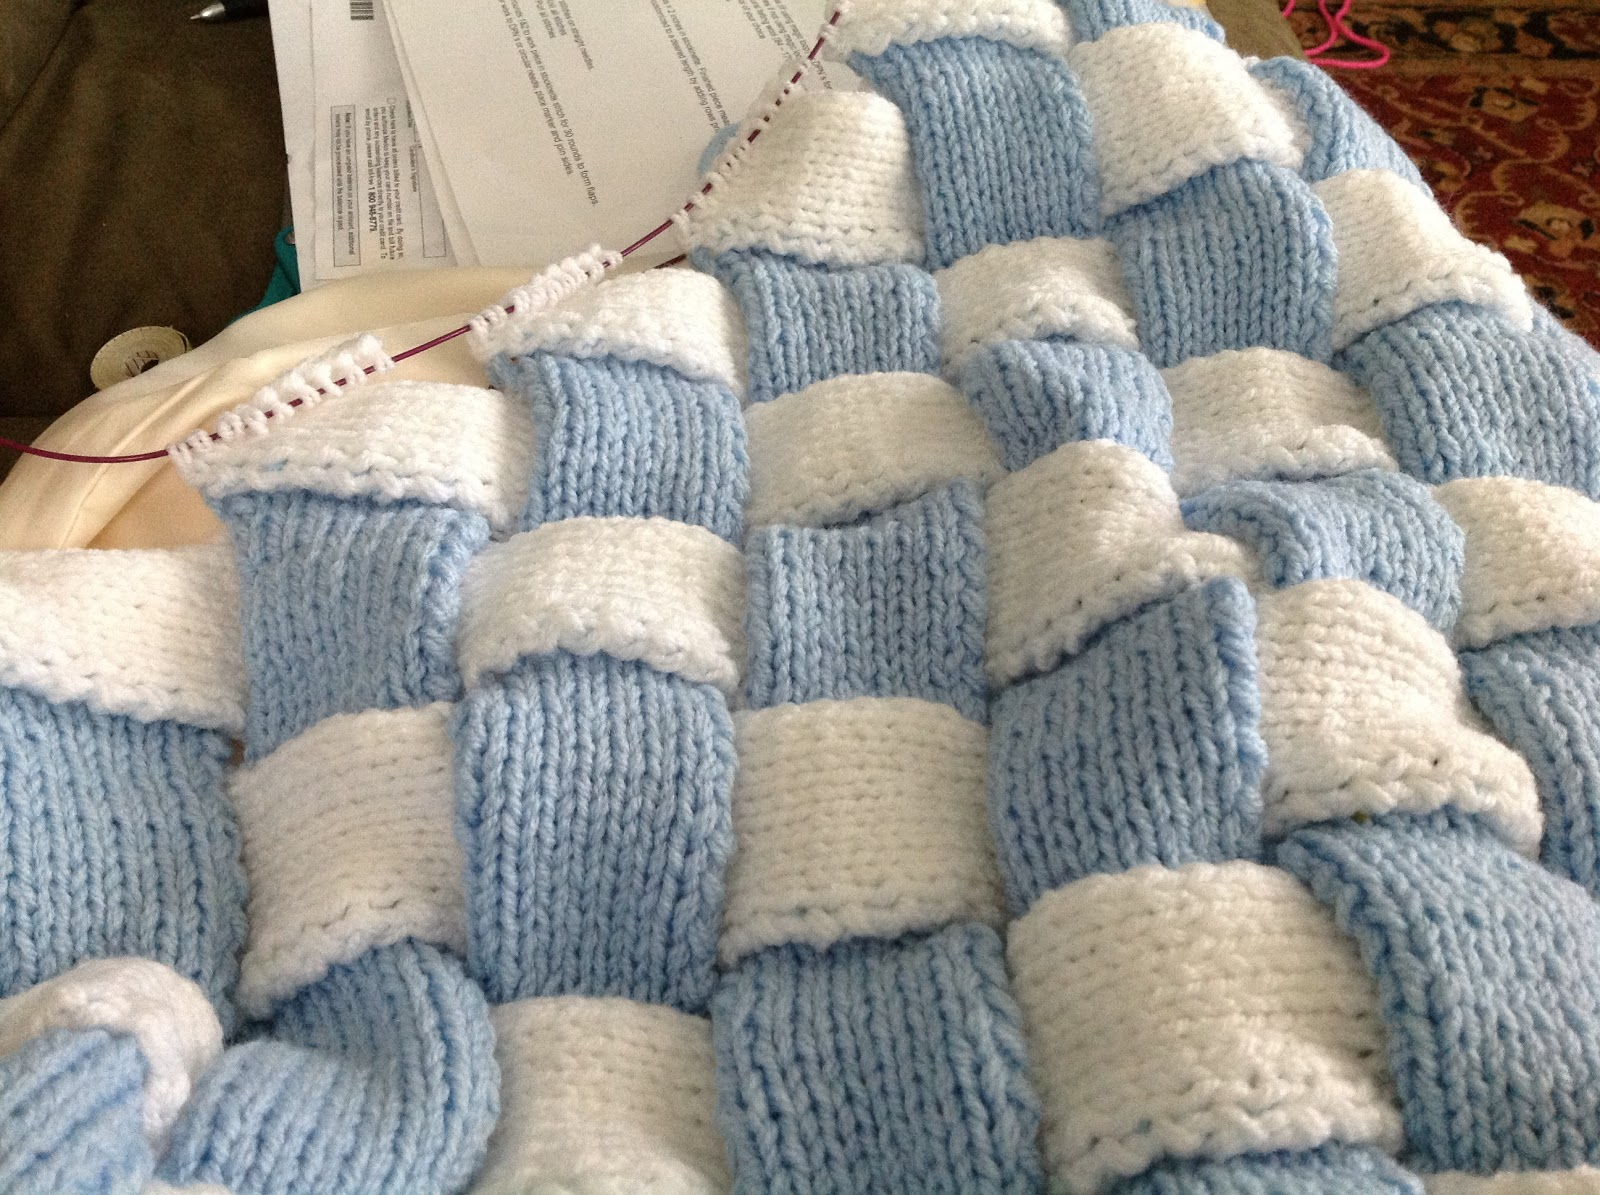 http://2.bp.blogspot.com/-eS-deqPlcpc/UHrFuXrQ63I/AAAAAAAAFhk/7pXSsPGXkmc/s1600/baby+blanket.jpg